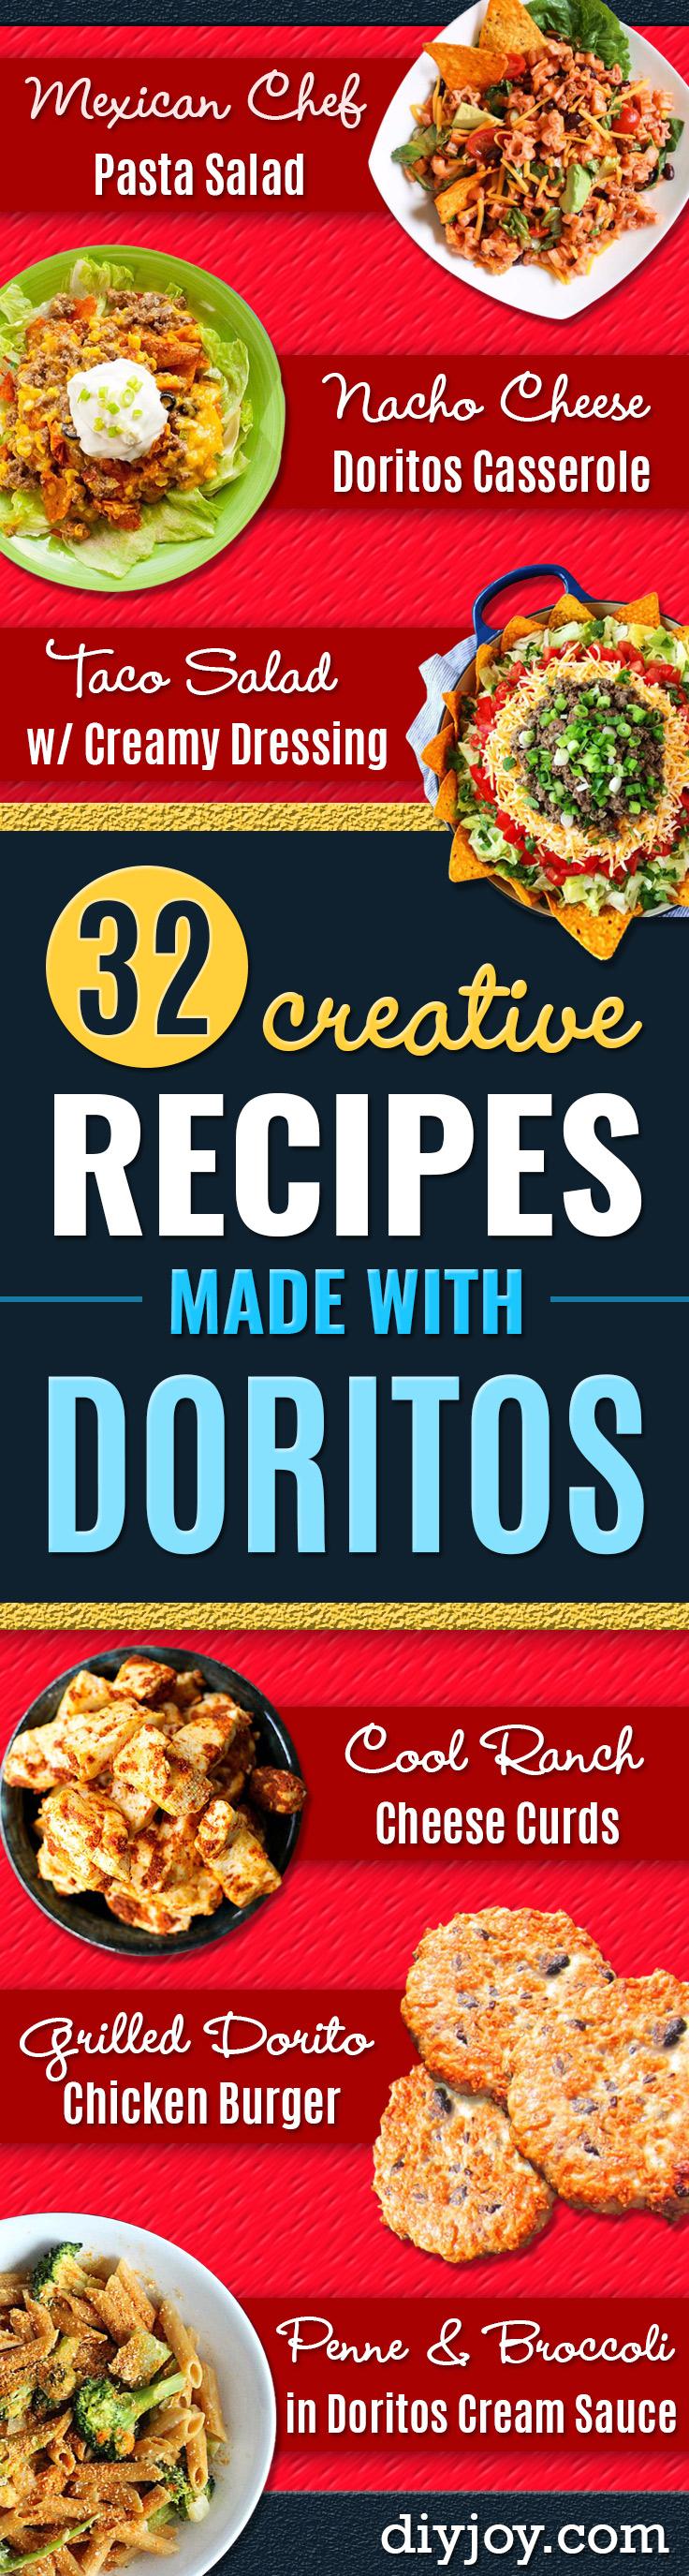 DIY Recipes Made With Doritos - Best Dorito Recipes for Casserole, Taco Salad, Chicken Dinners, Beef Casseroles, Nachos, Easy Cool Ranch Meals and Ideas for Dips, Snacks and Kids Recipe Tutorials - Quick Lunch Ideas and Recipes for Parties http://diyjoy.com/recipe-ideas-doritos